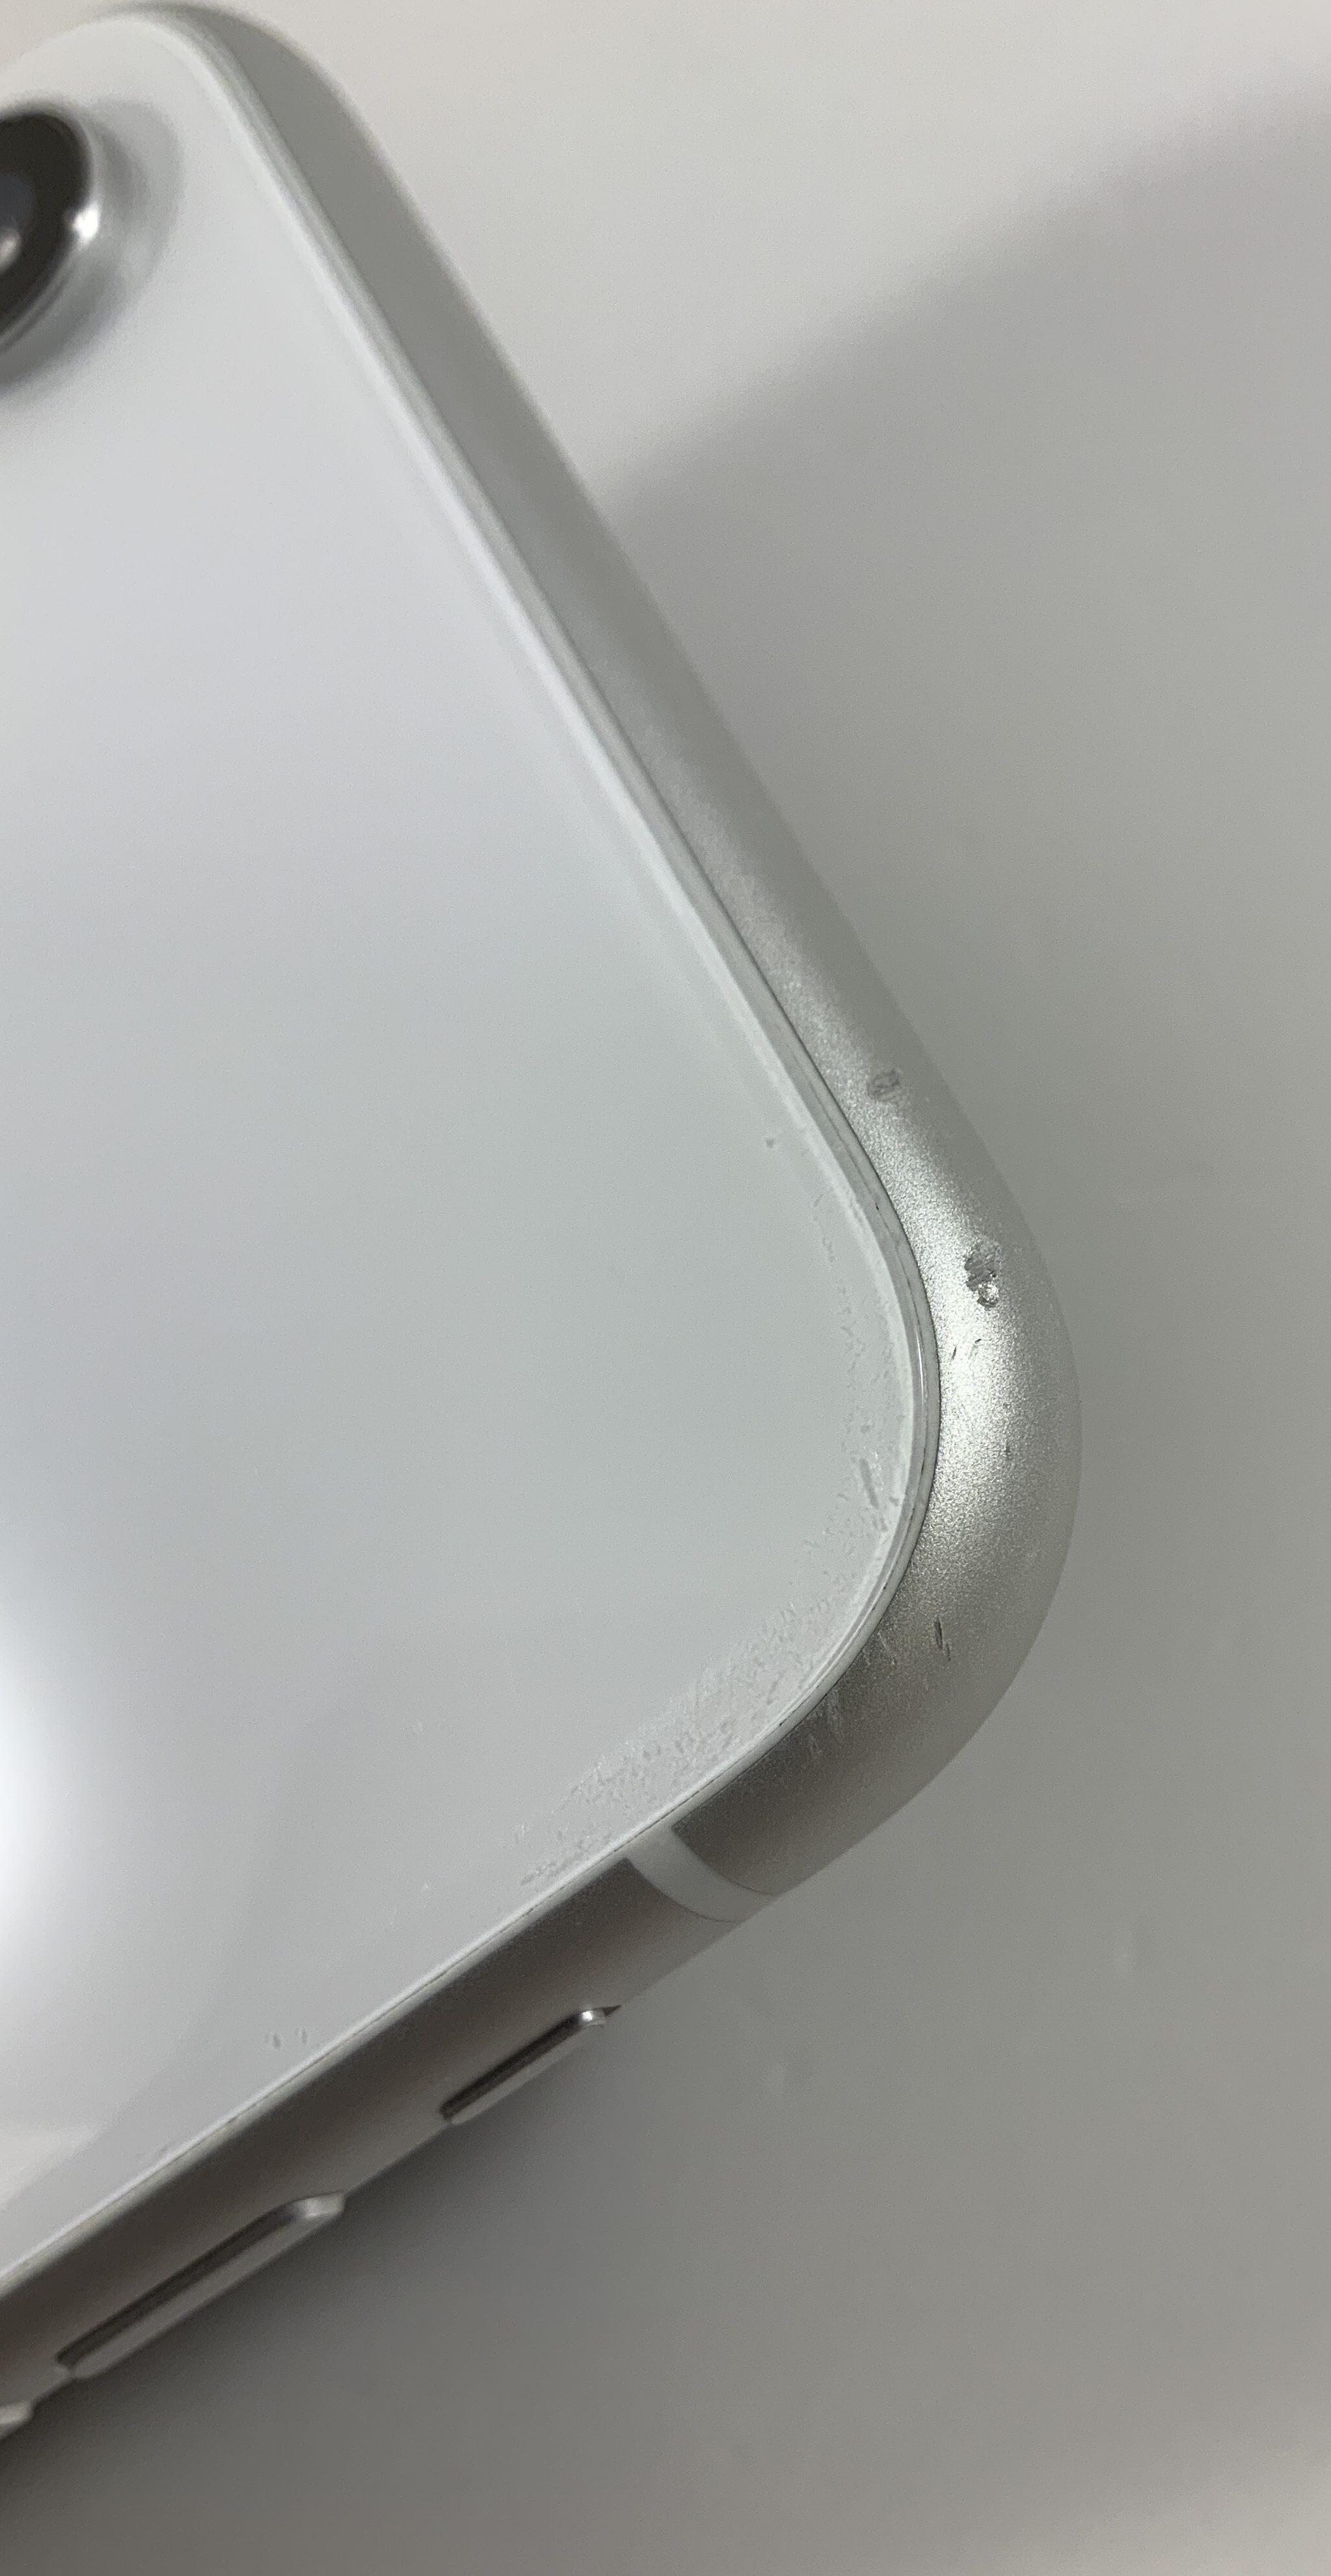 iPhone XR 128GB, 128GB, White, image 6